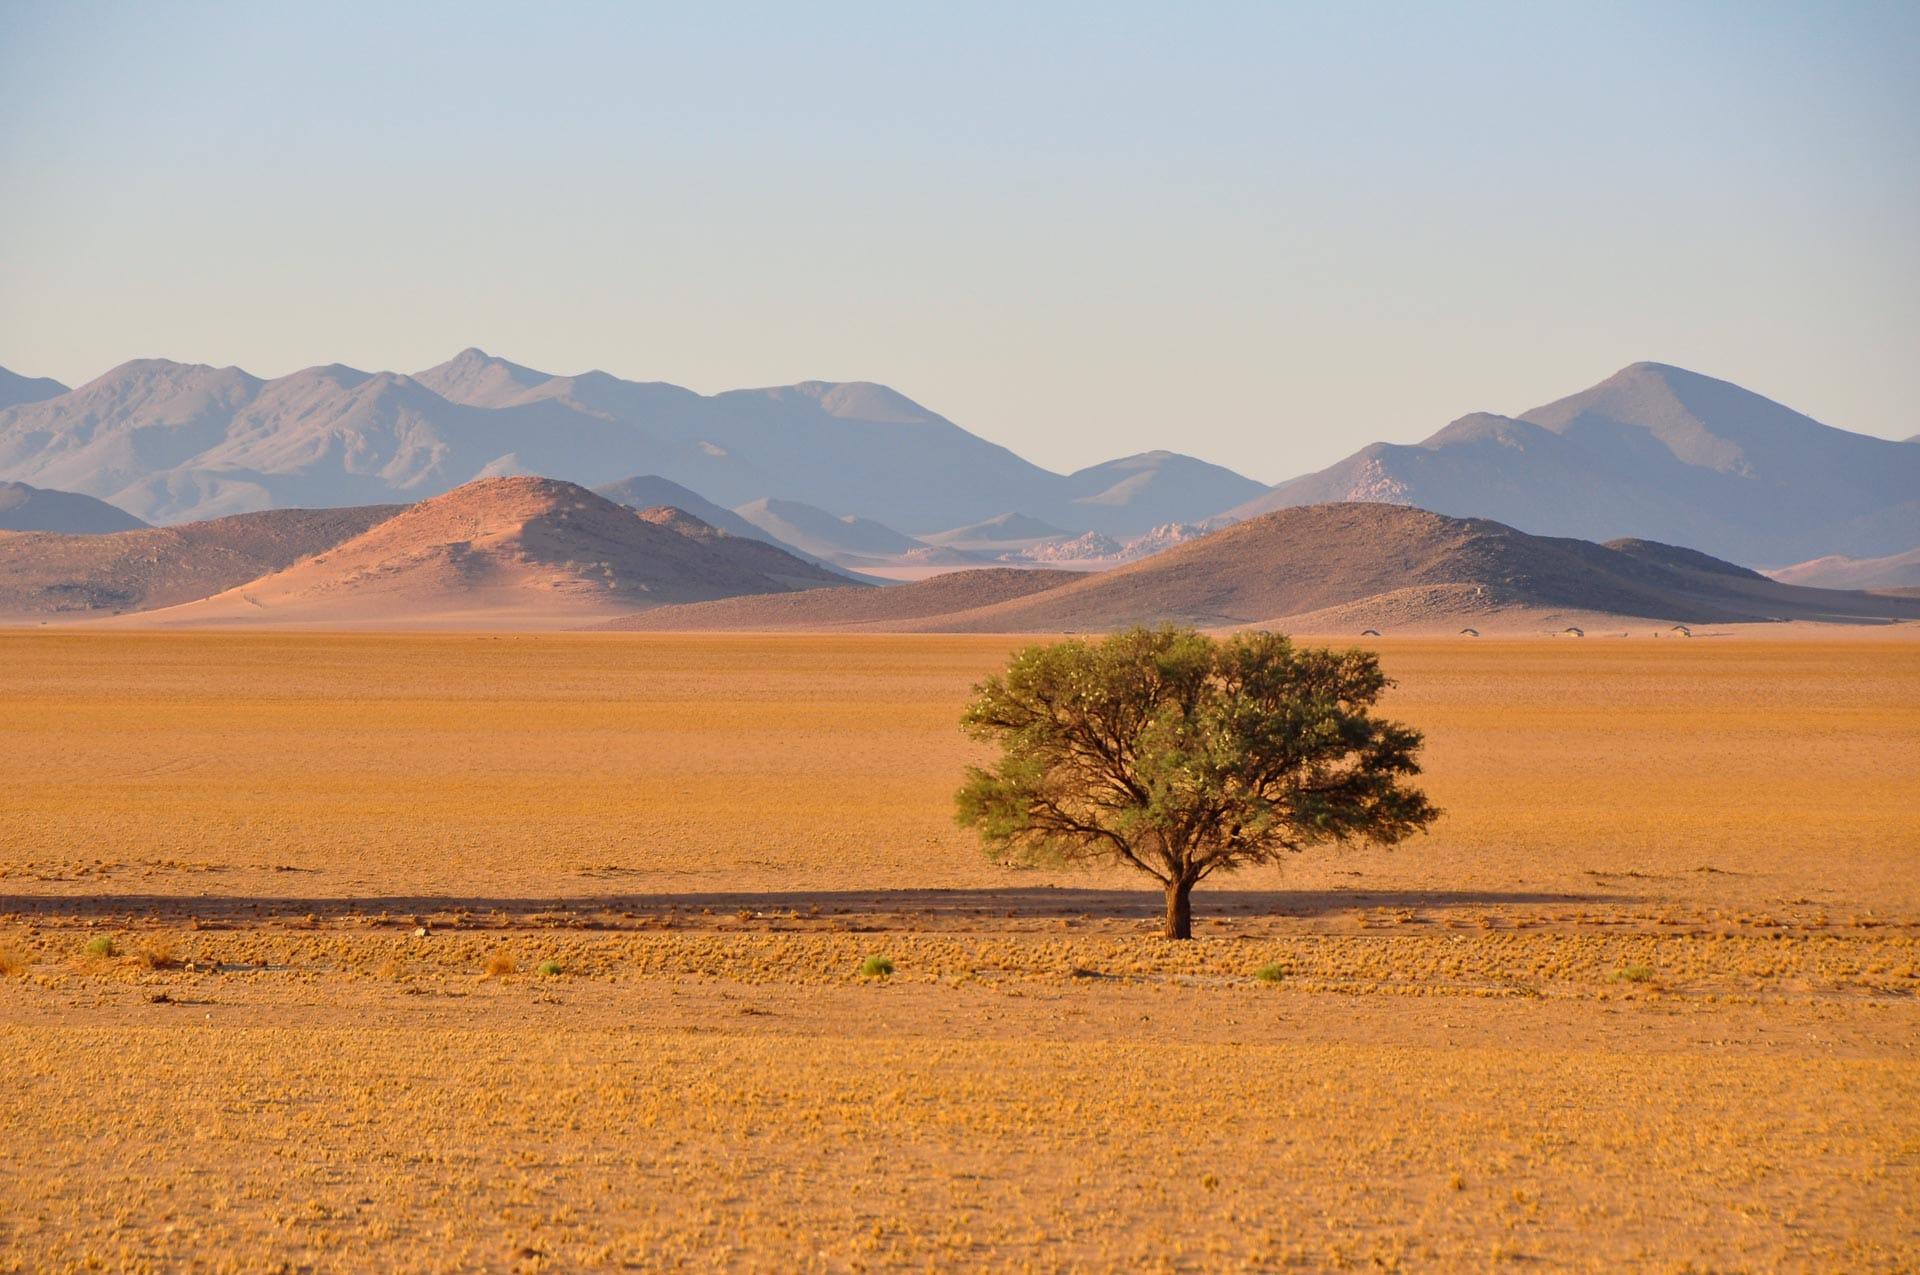 Kanaan-Desert-Retreat-Namibia-Globetrotter-Select-18